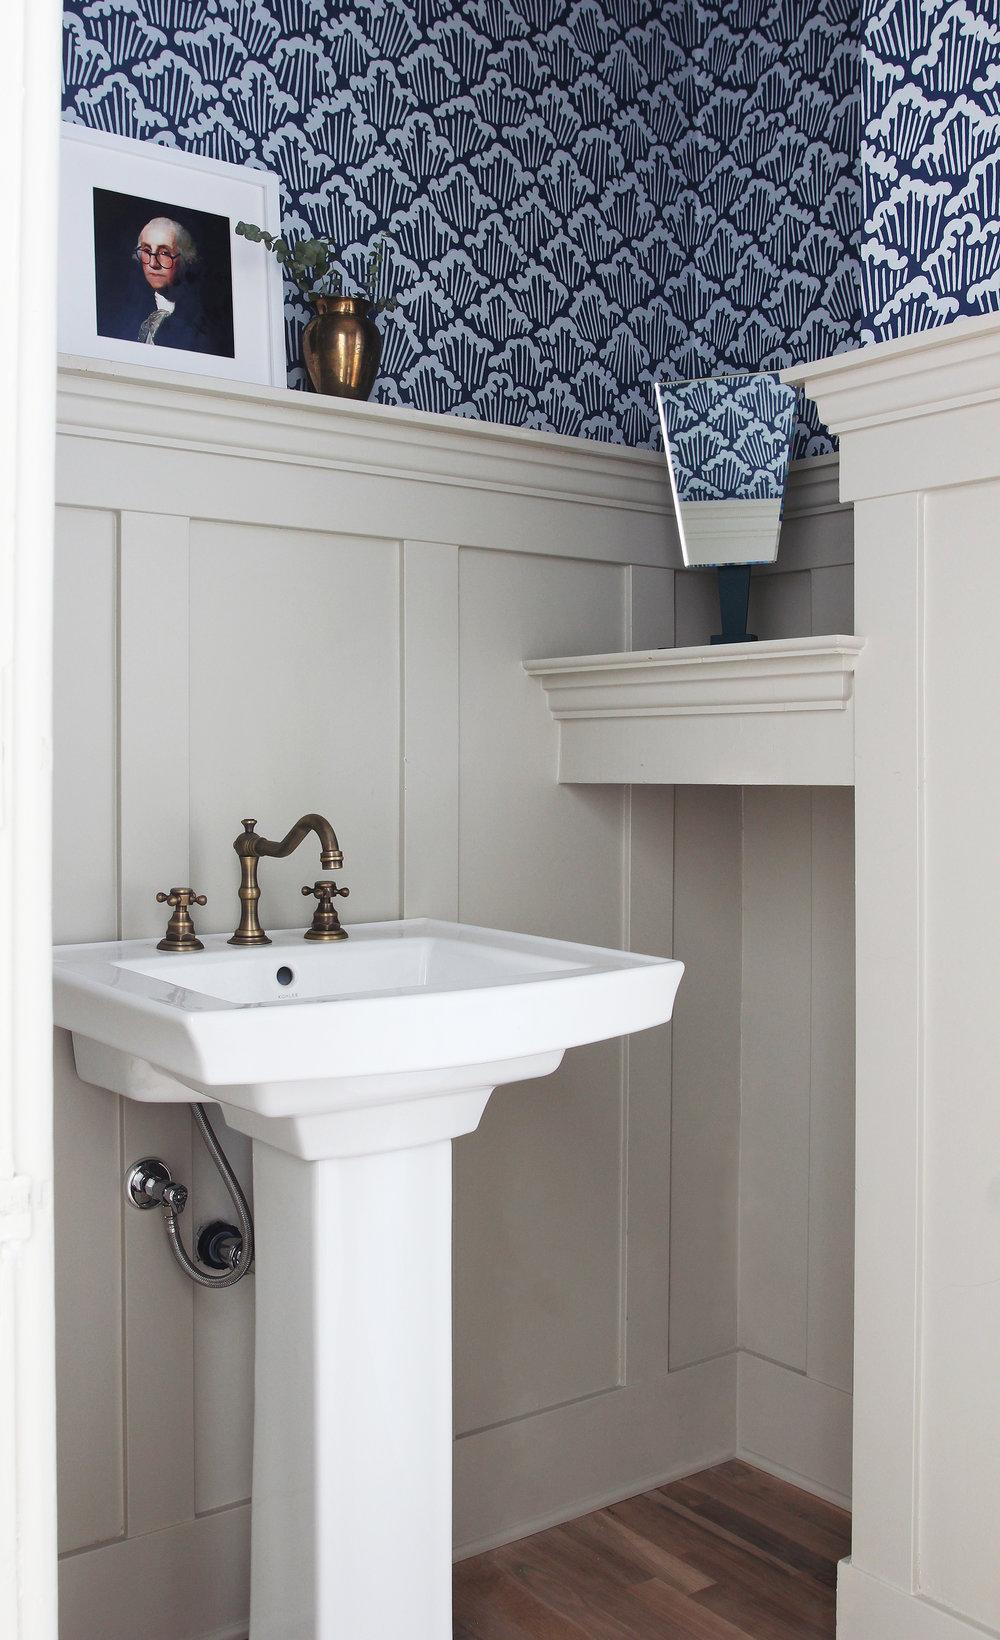 The Grit and Polish - Porch Powder Bathroom sink low CLEAN